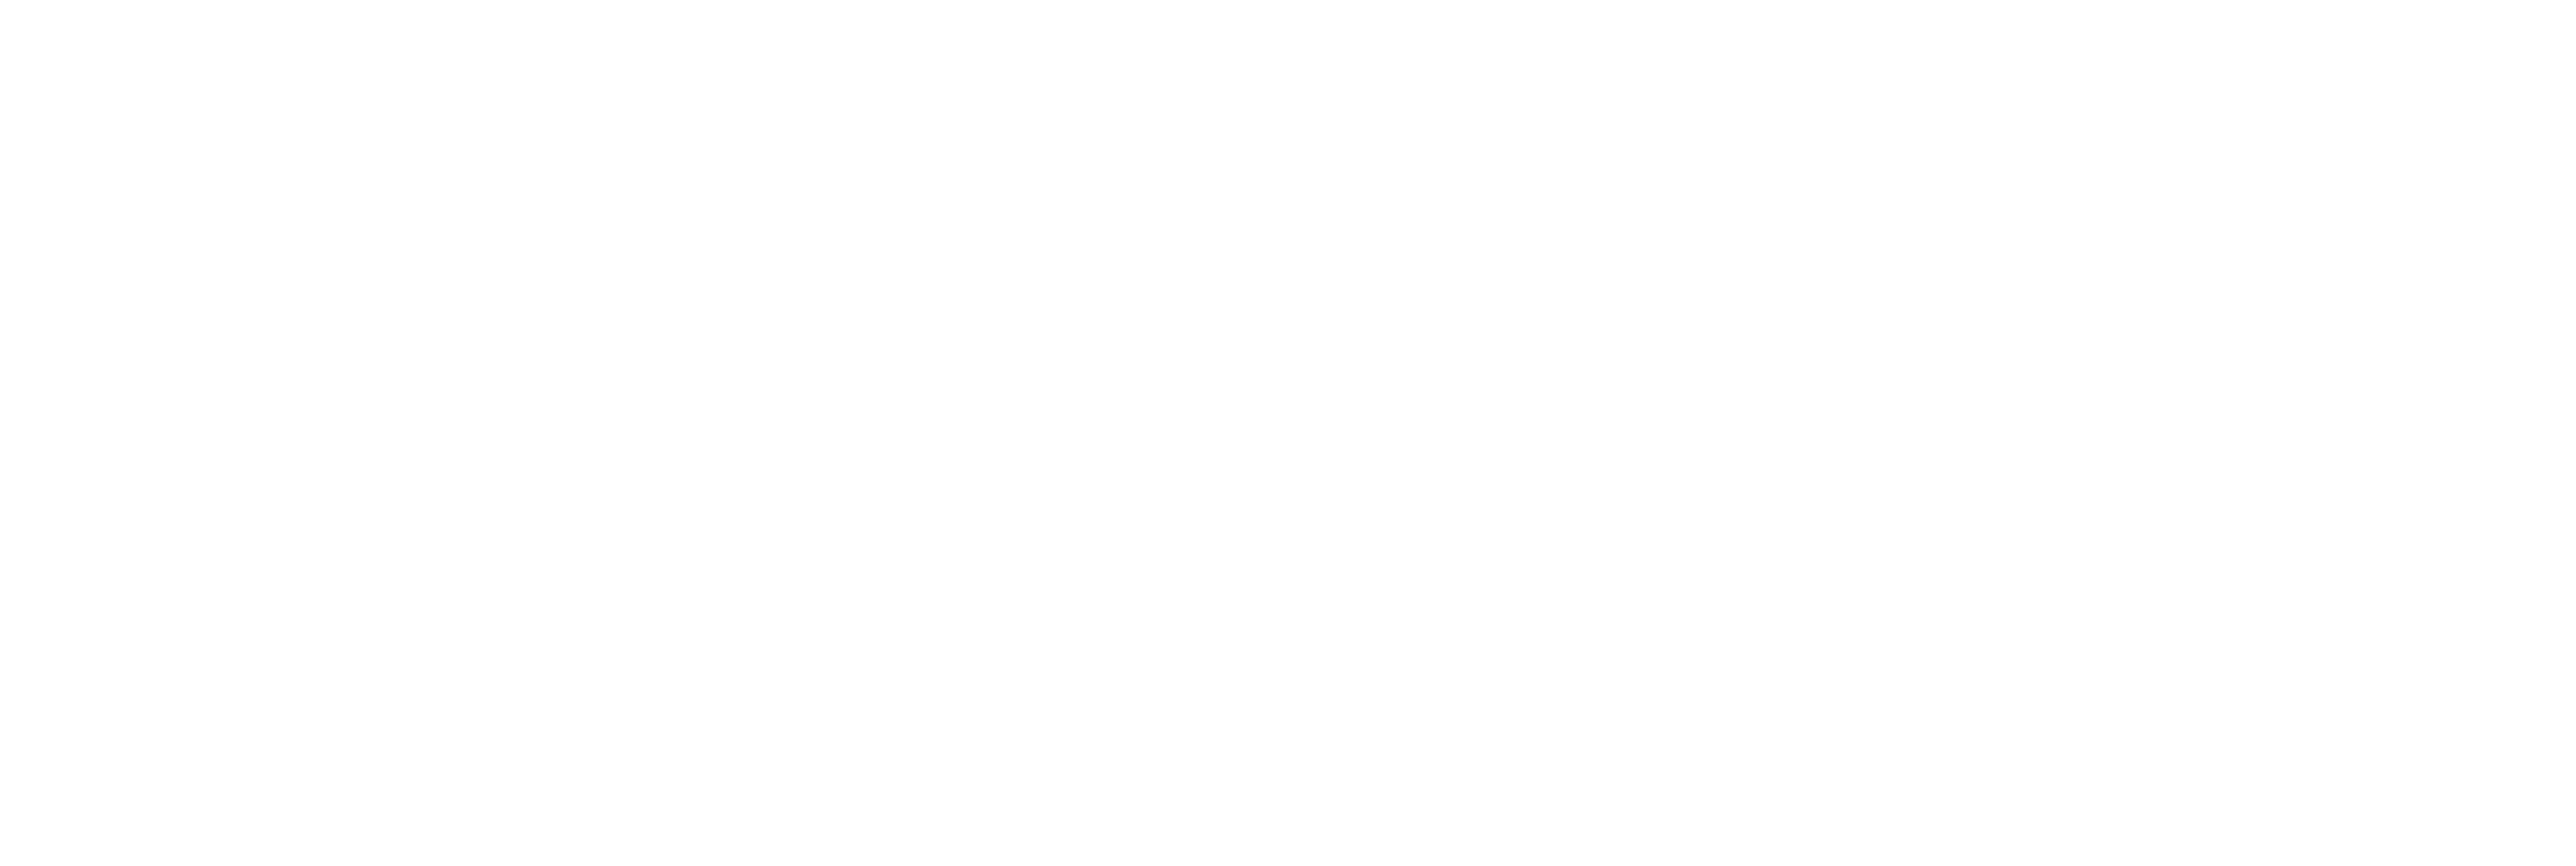 Autocito